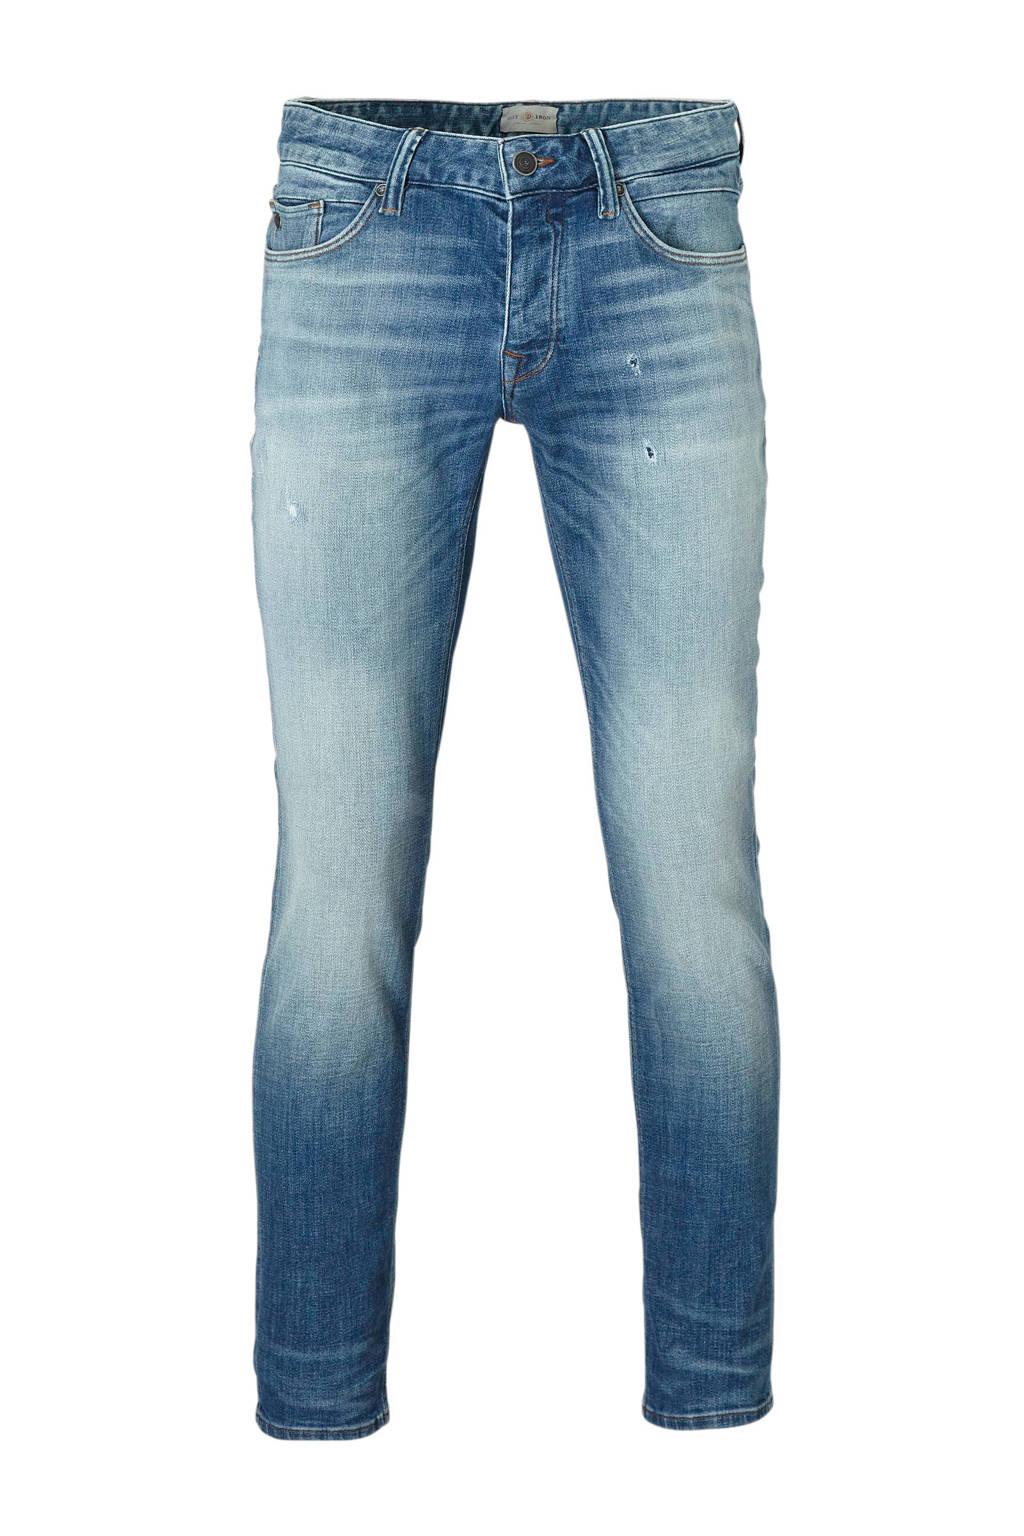 Cast Iron slim fit jeans Riser, Light denim